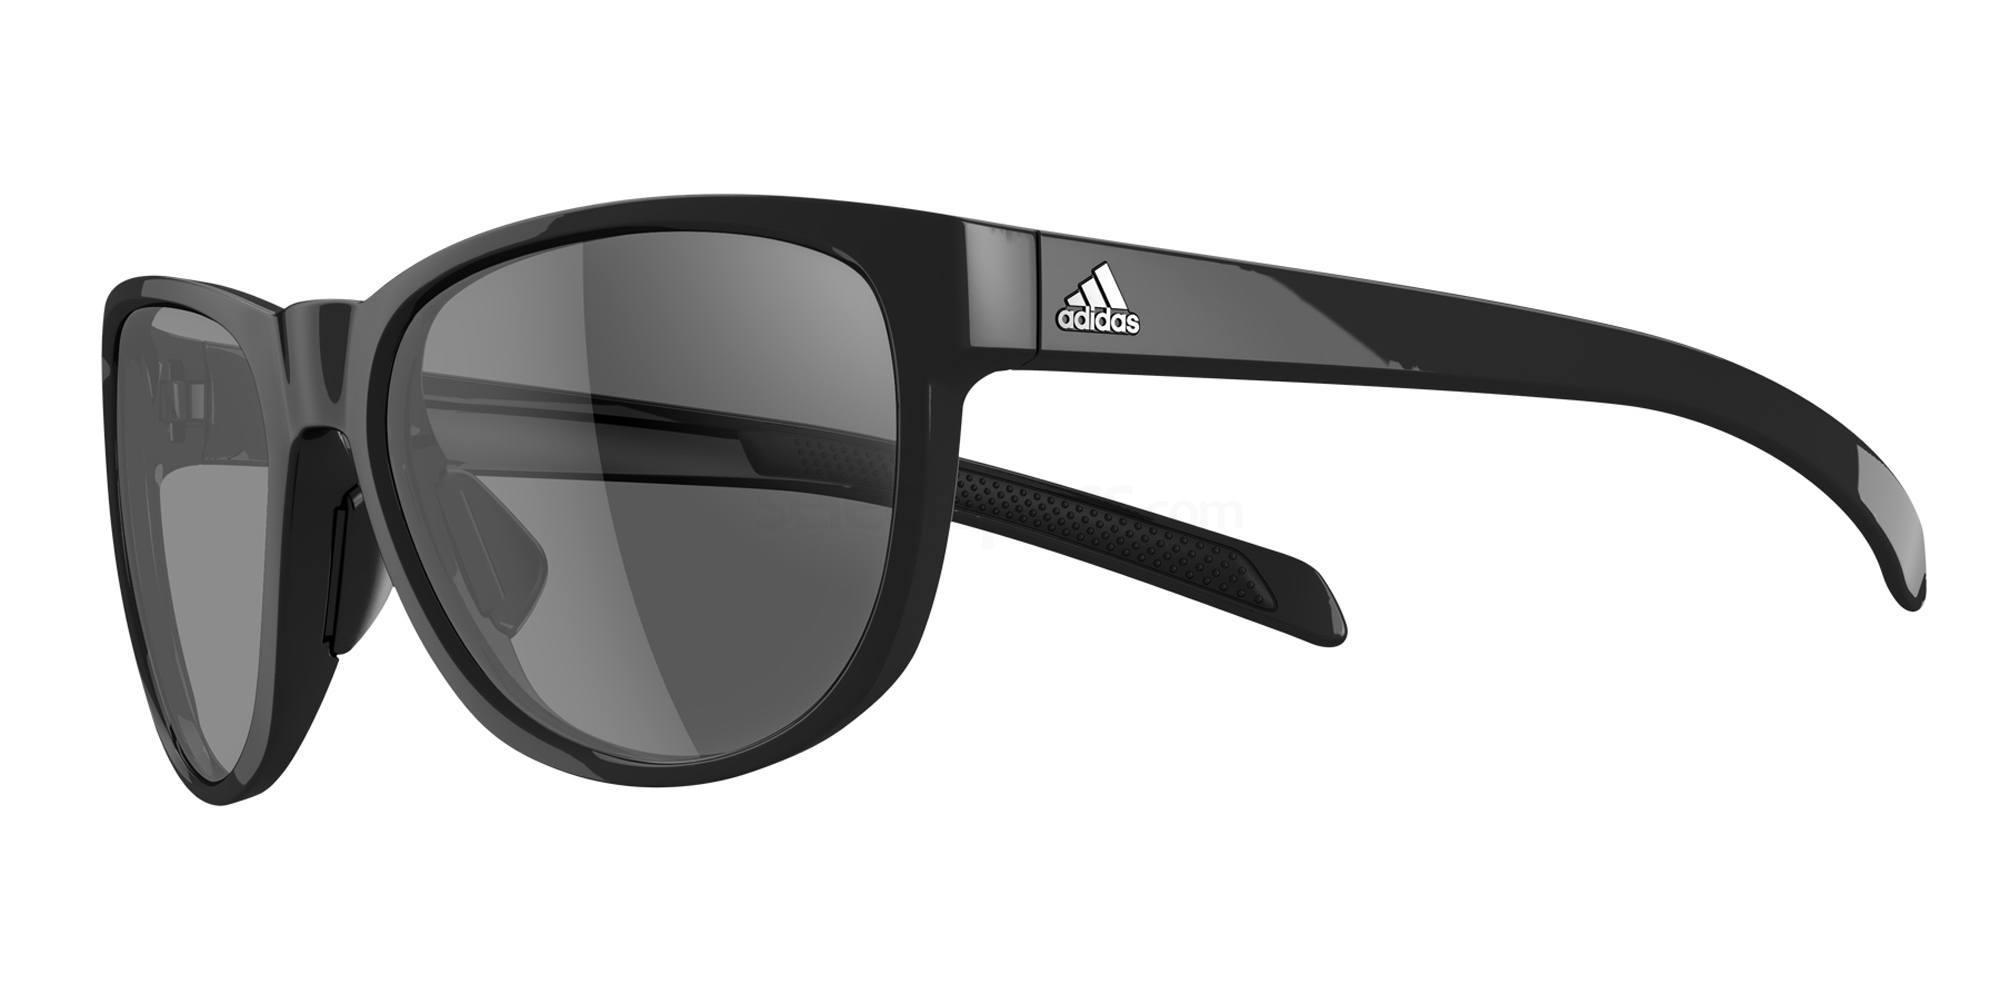 a425 00 6050 a425 wildcharge Sunglasses, Adidas